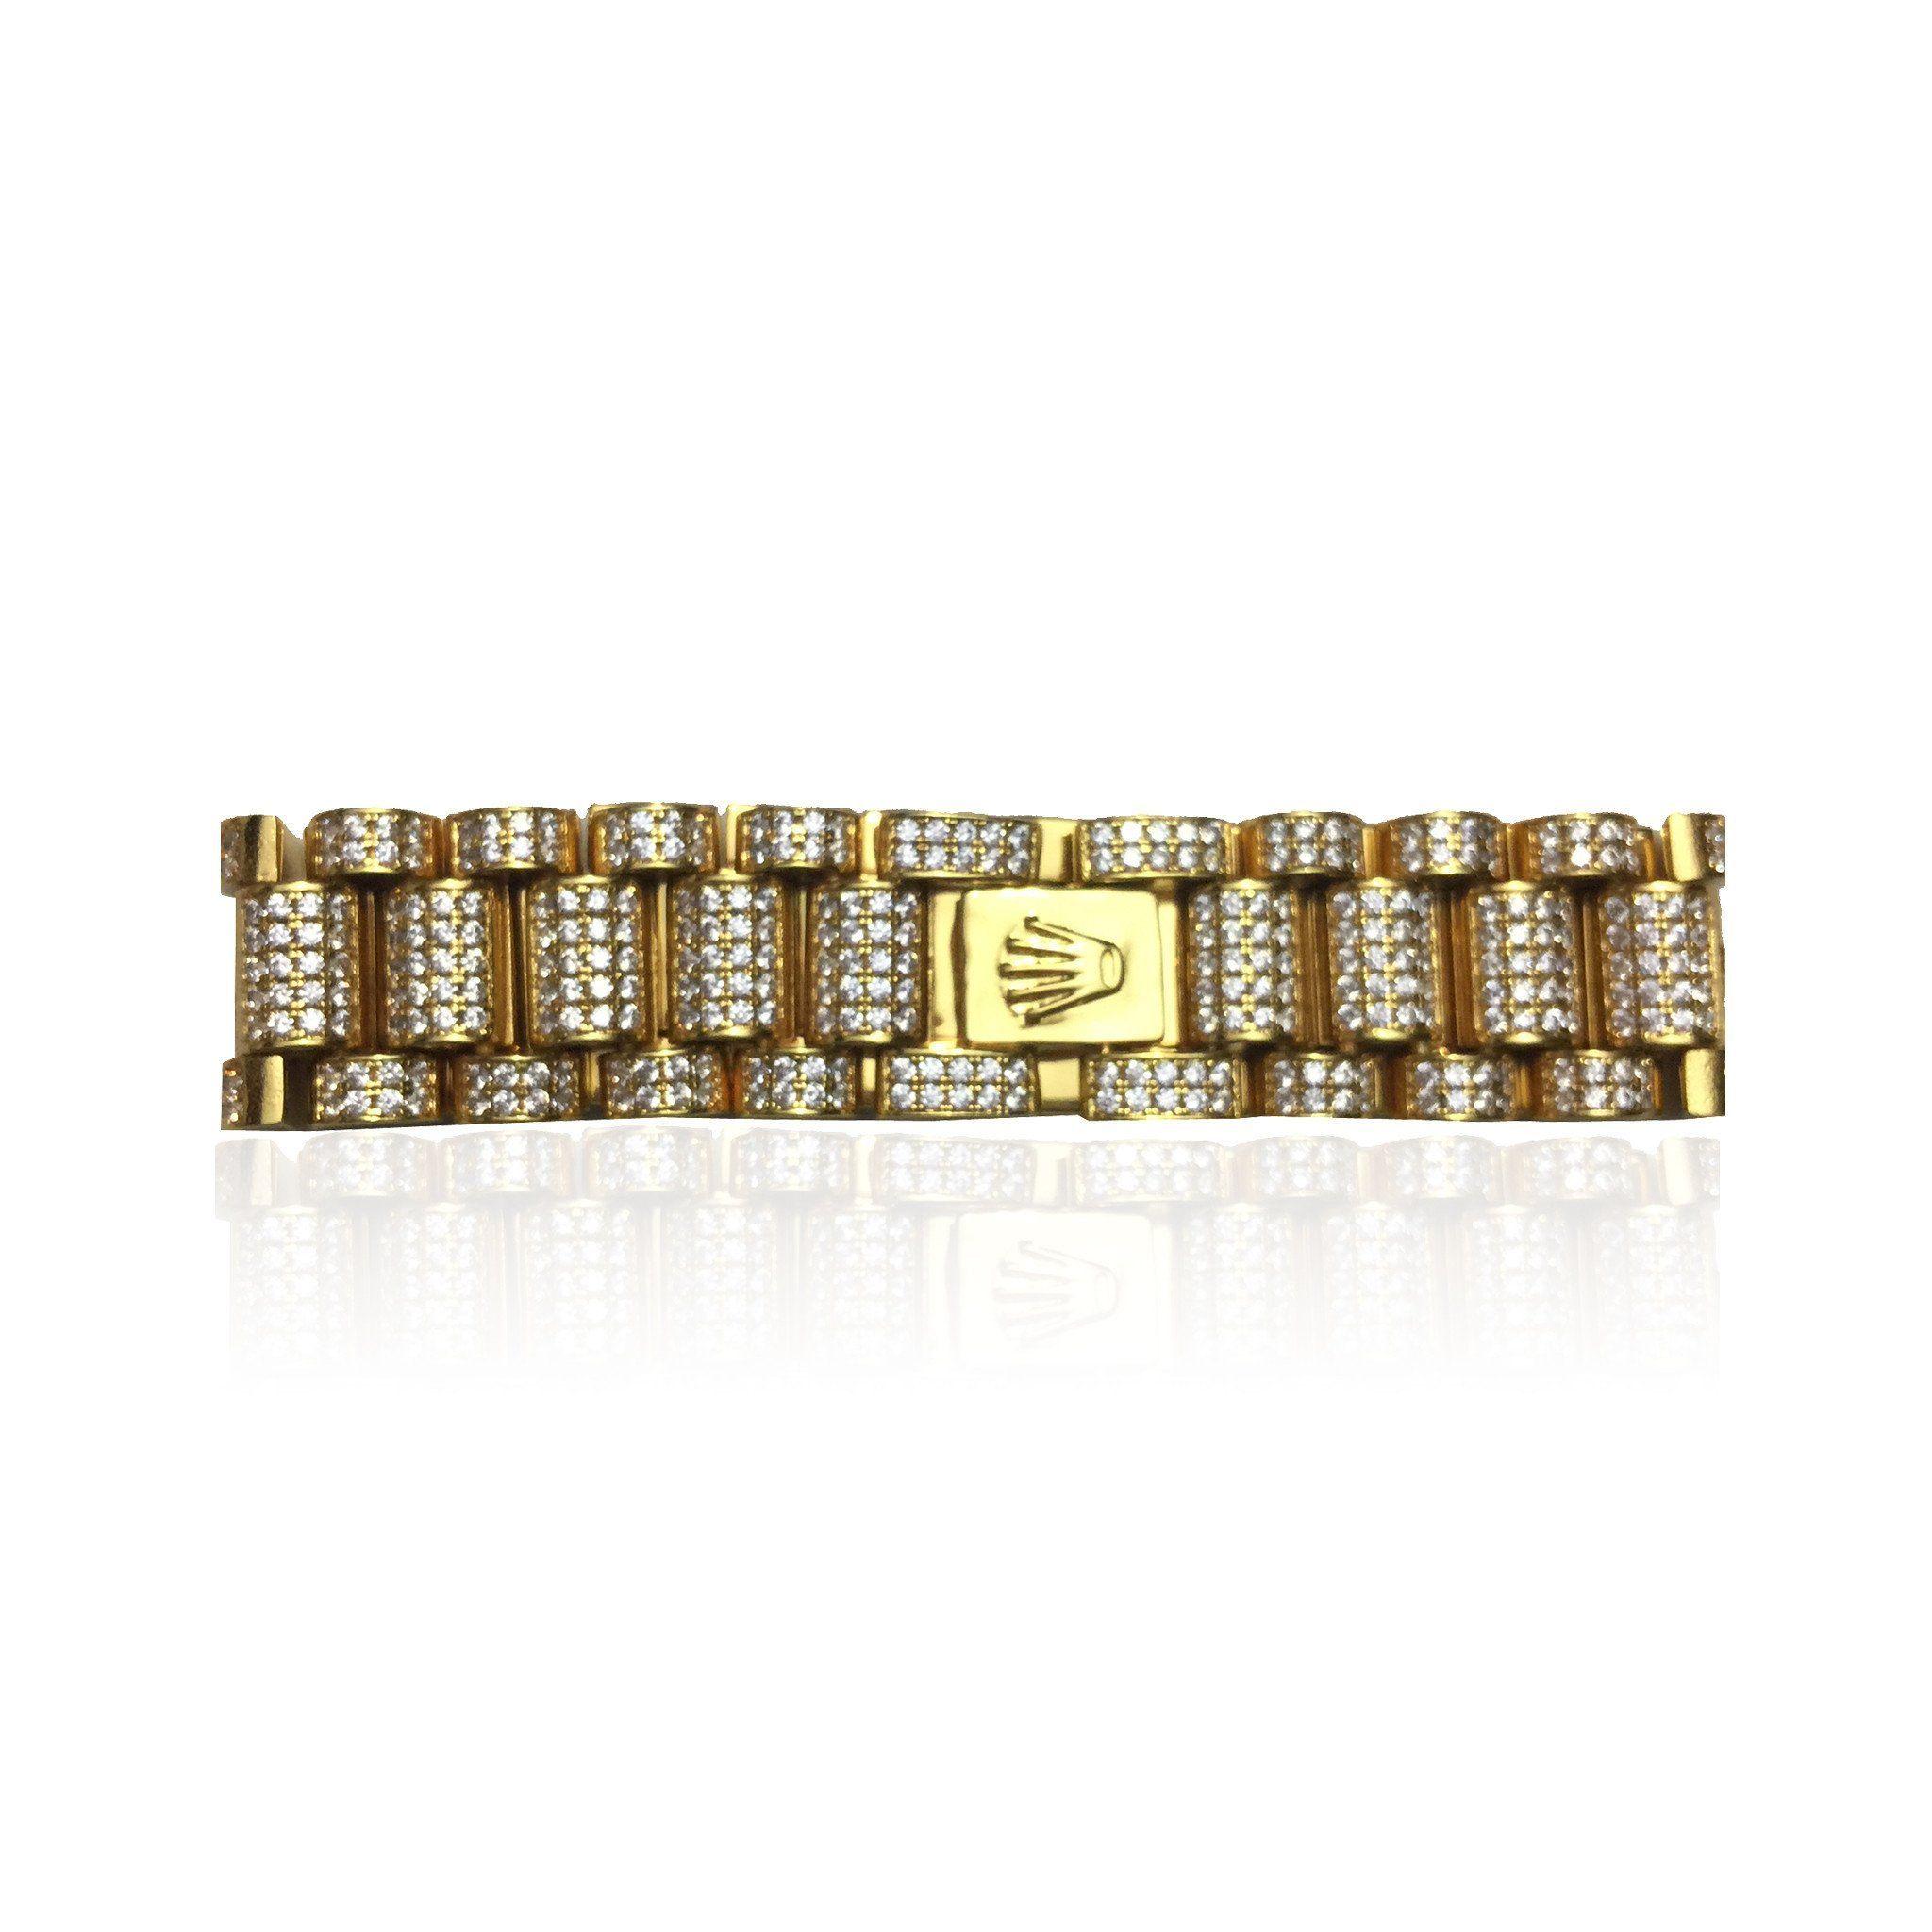 Rolex Presidential bracelet now live on s